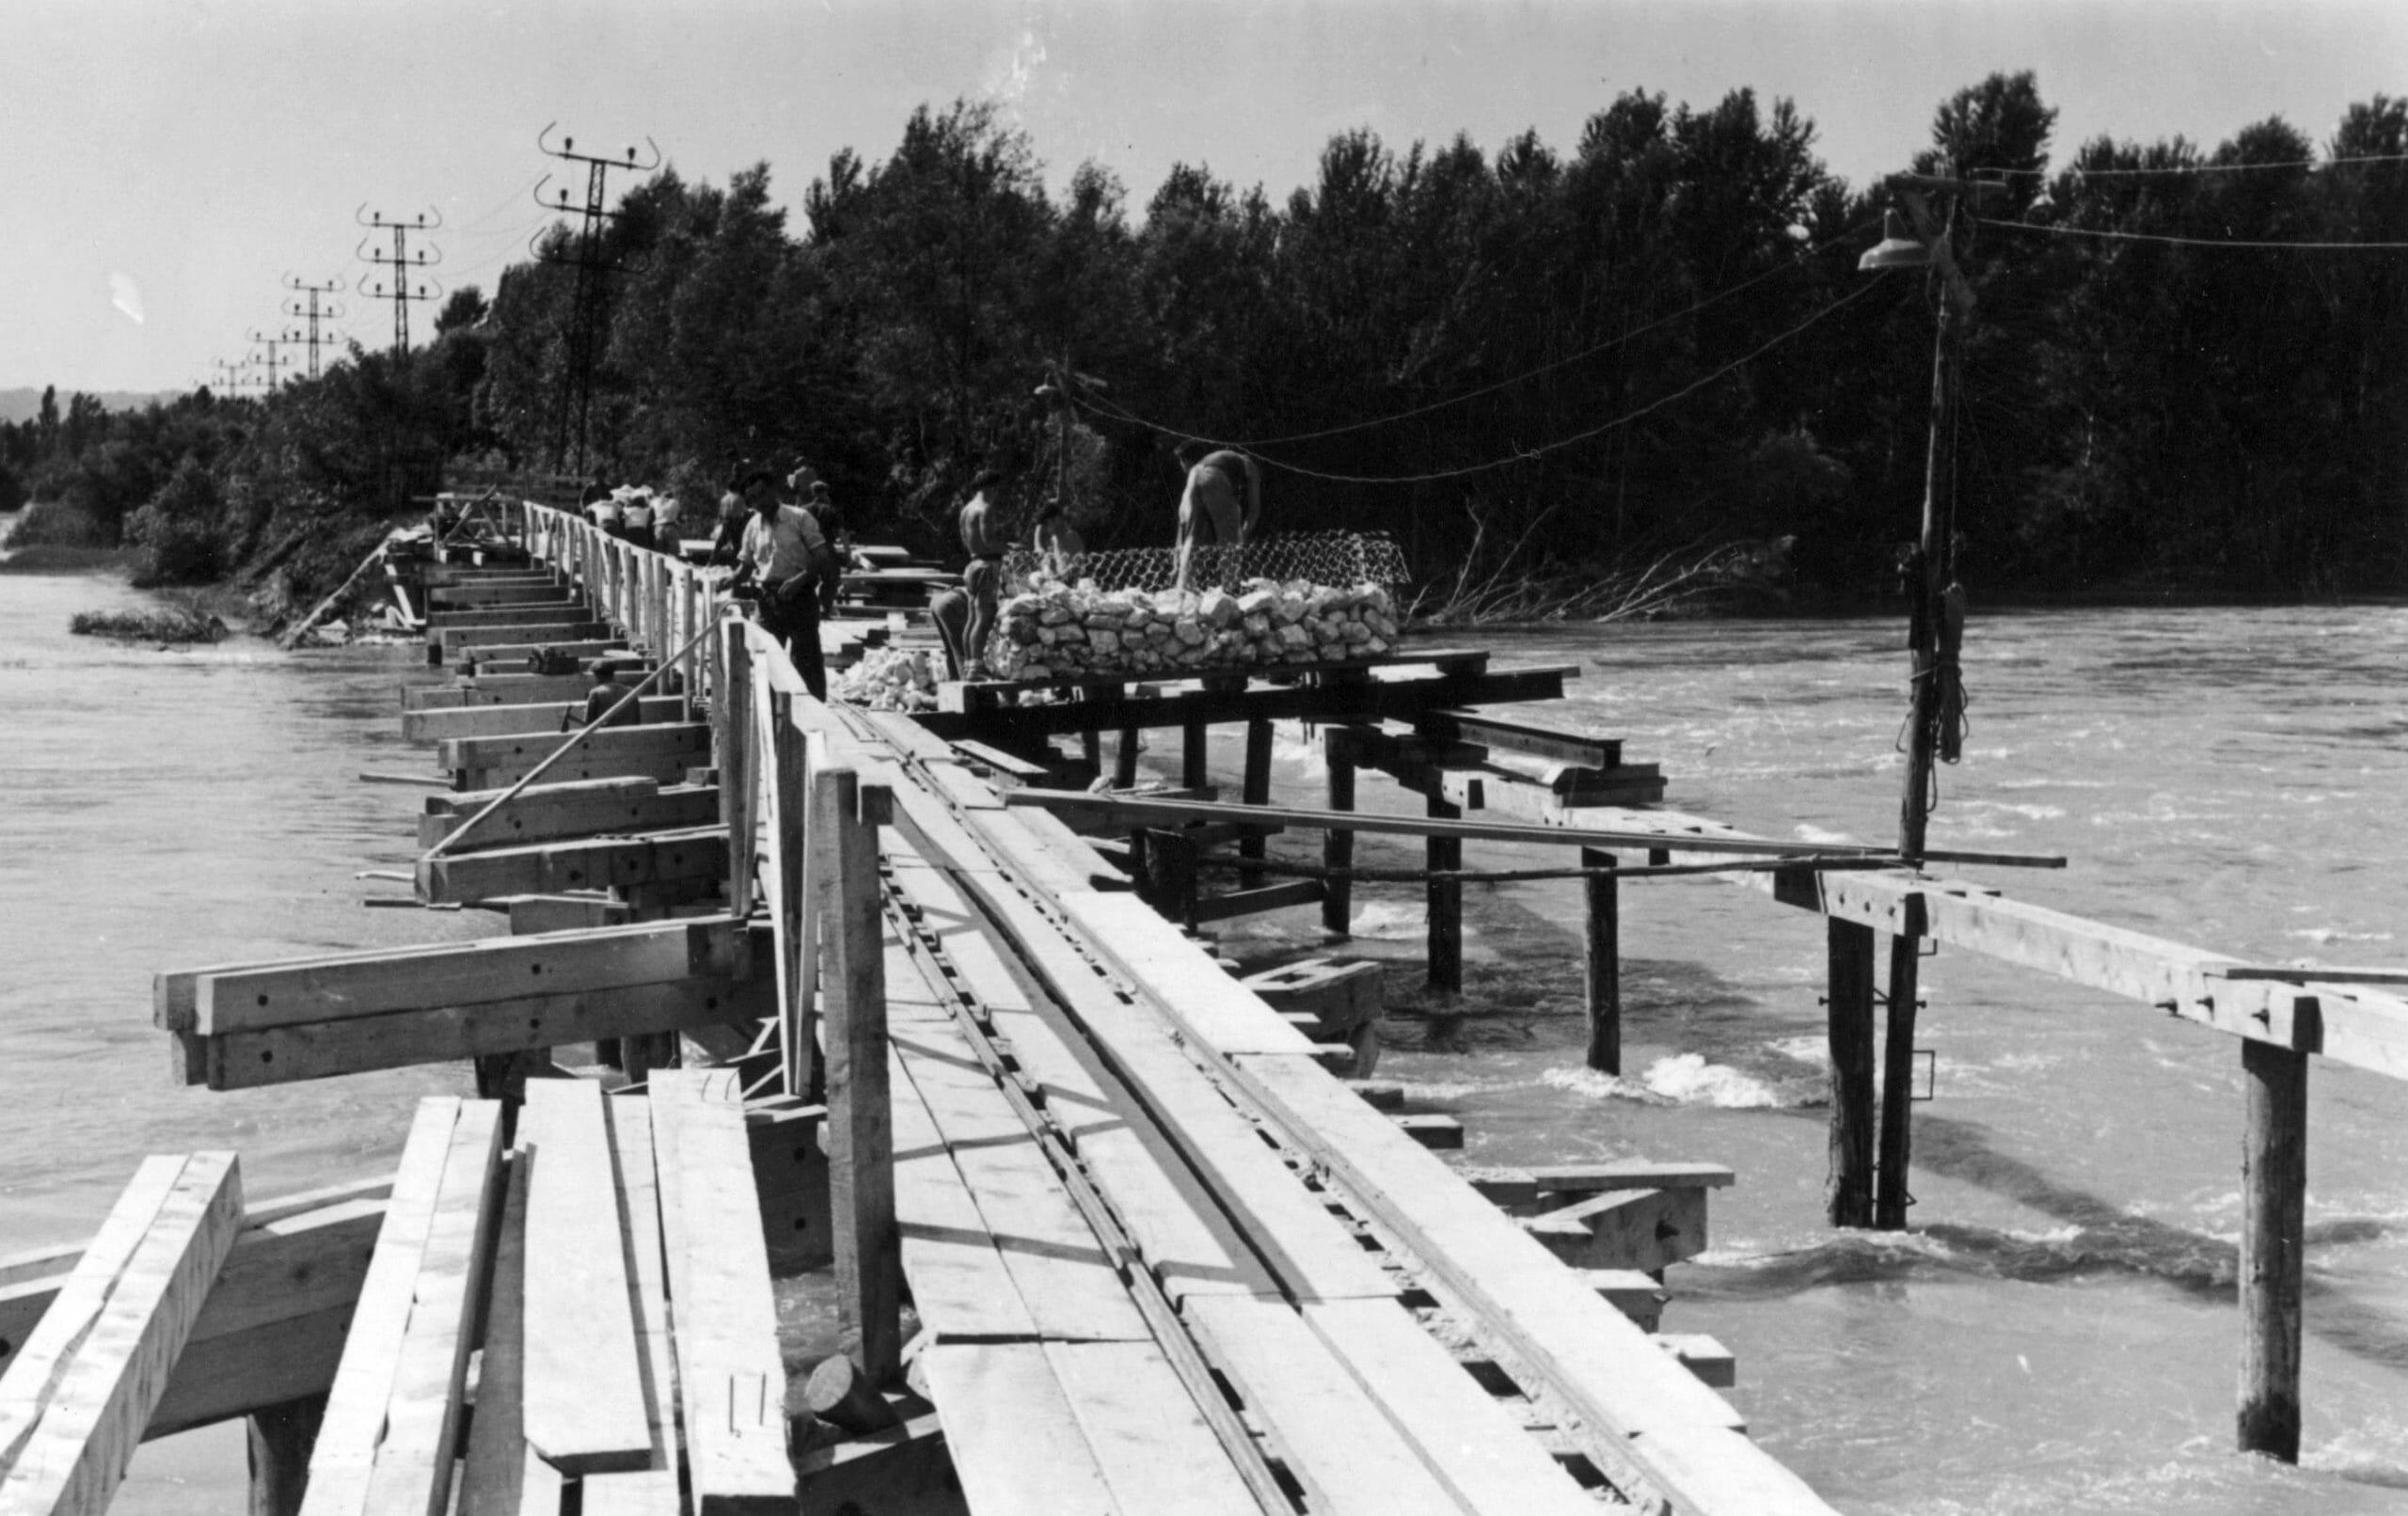 BRECHE PALLUEL TRAVAUX 2 CRUE JUIN 1948